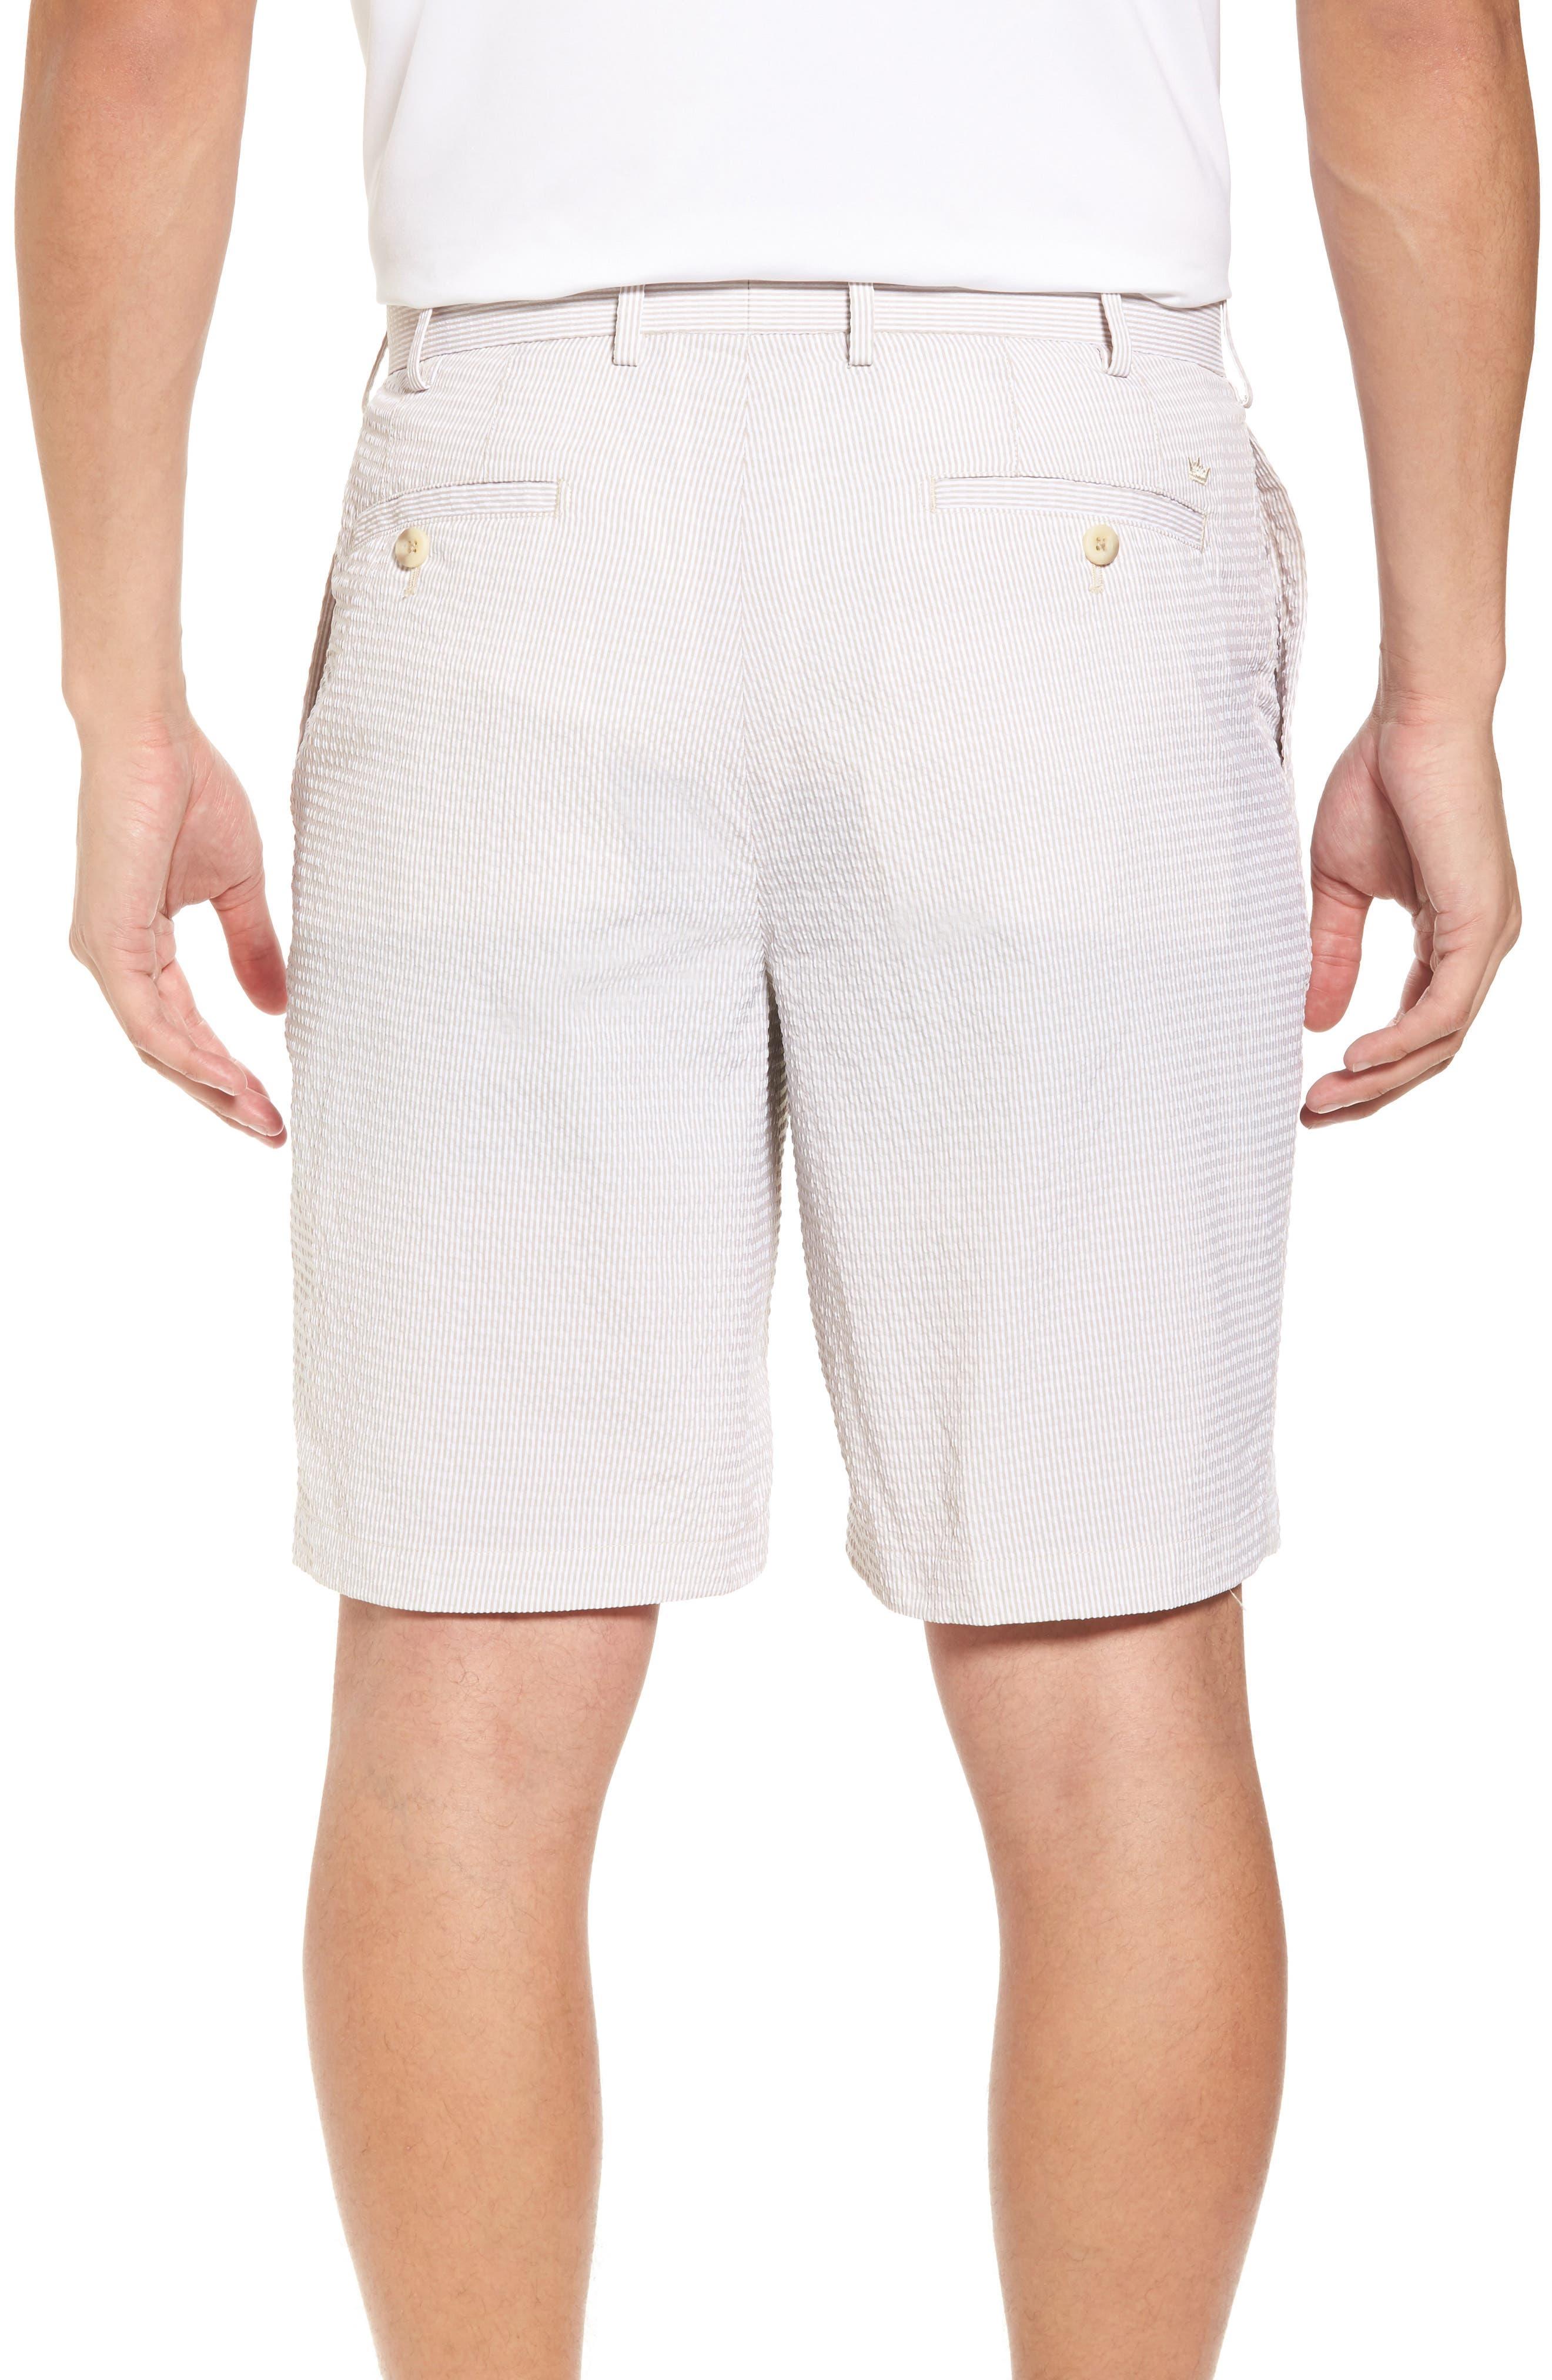 Apex Pinstripe Seersucker Shorts,                             Alternate thumbnail 2, color,                             Khaki